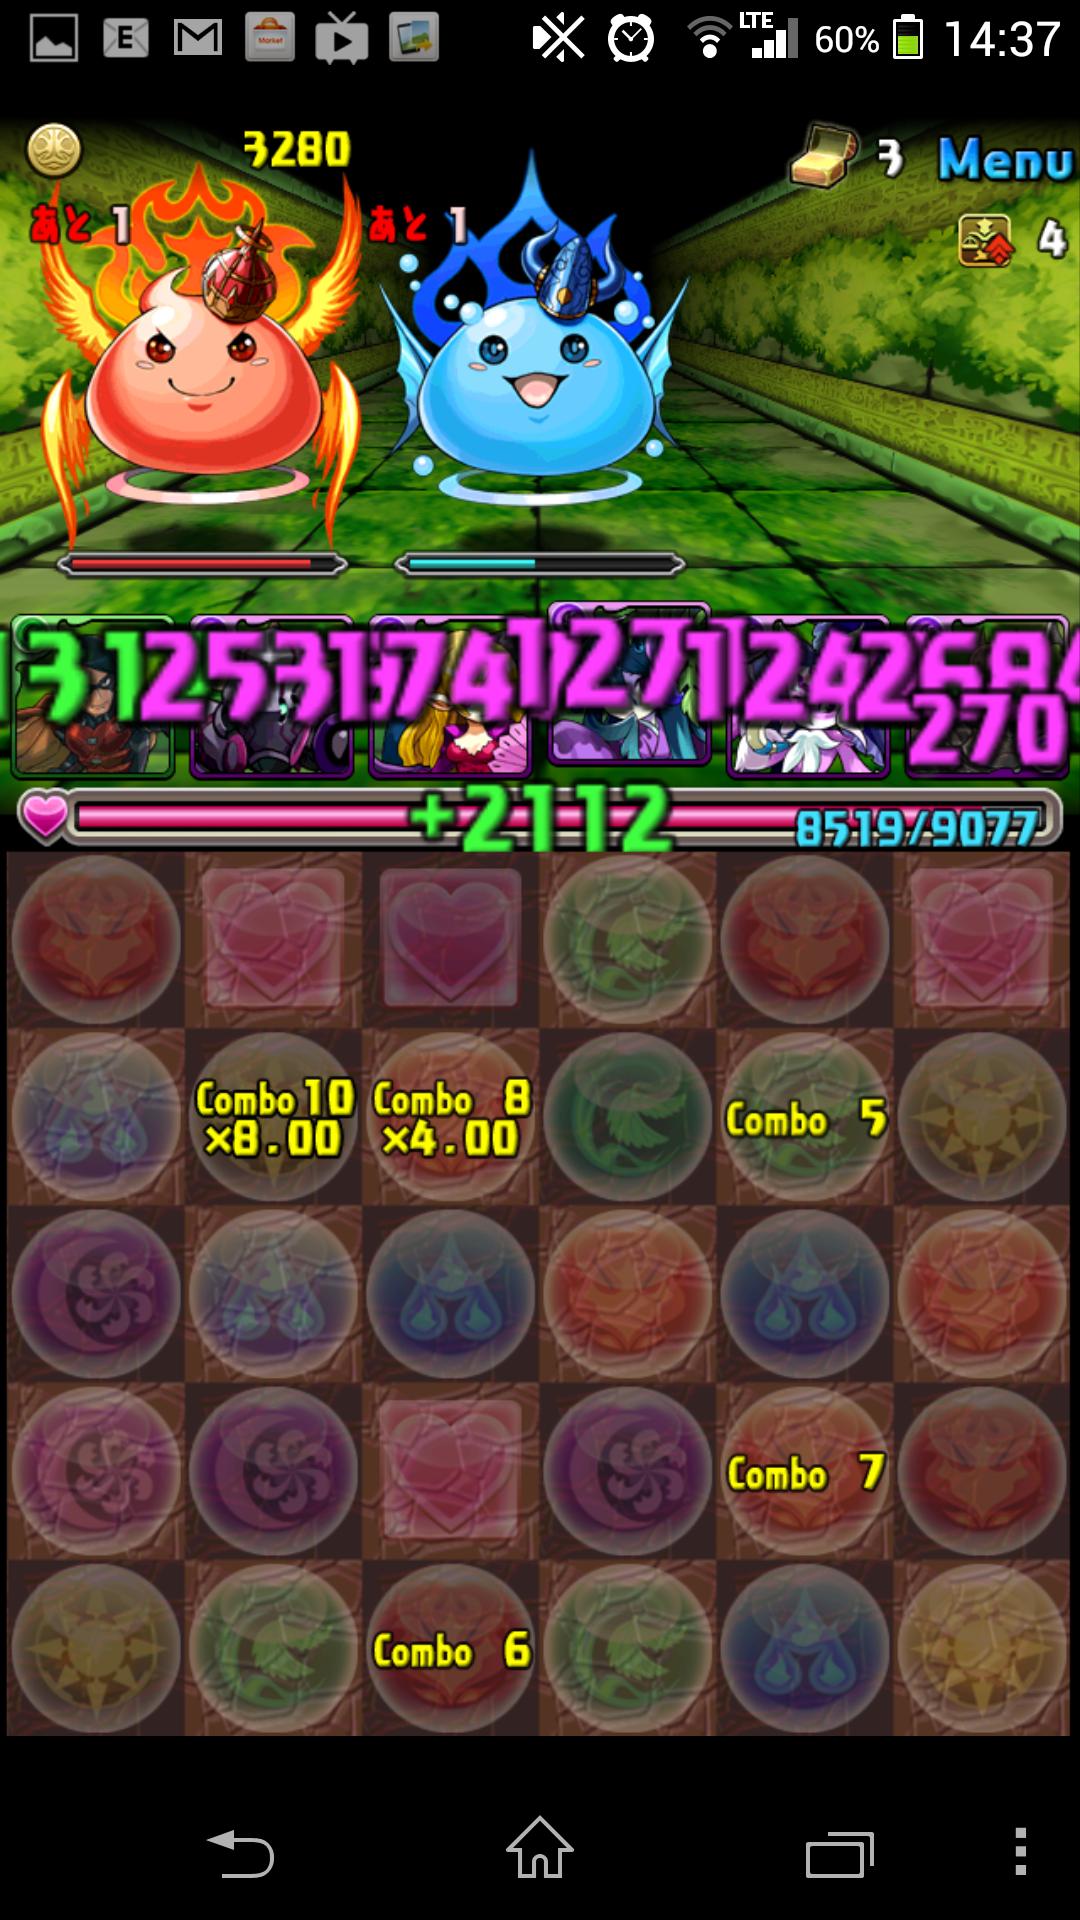 Screenshot_2014-04-01-14-37-04.png